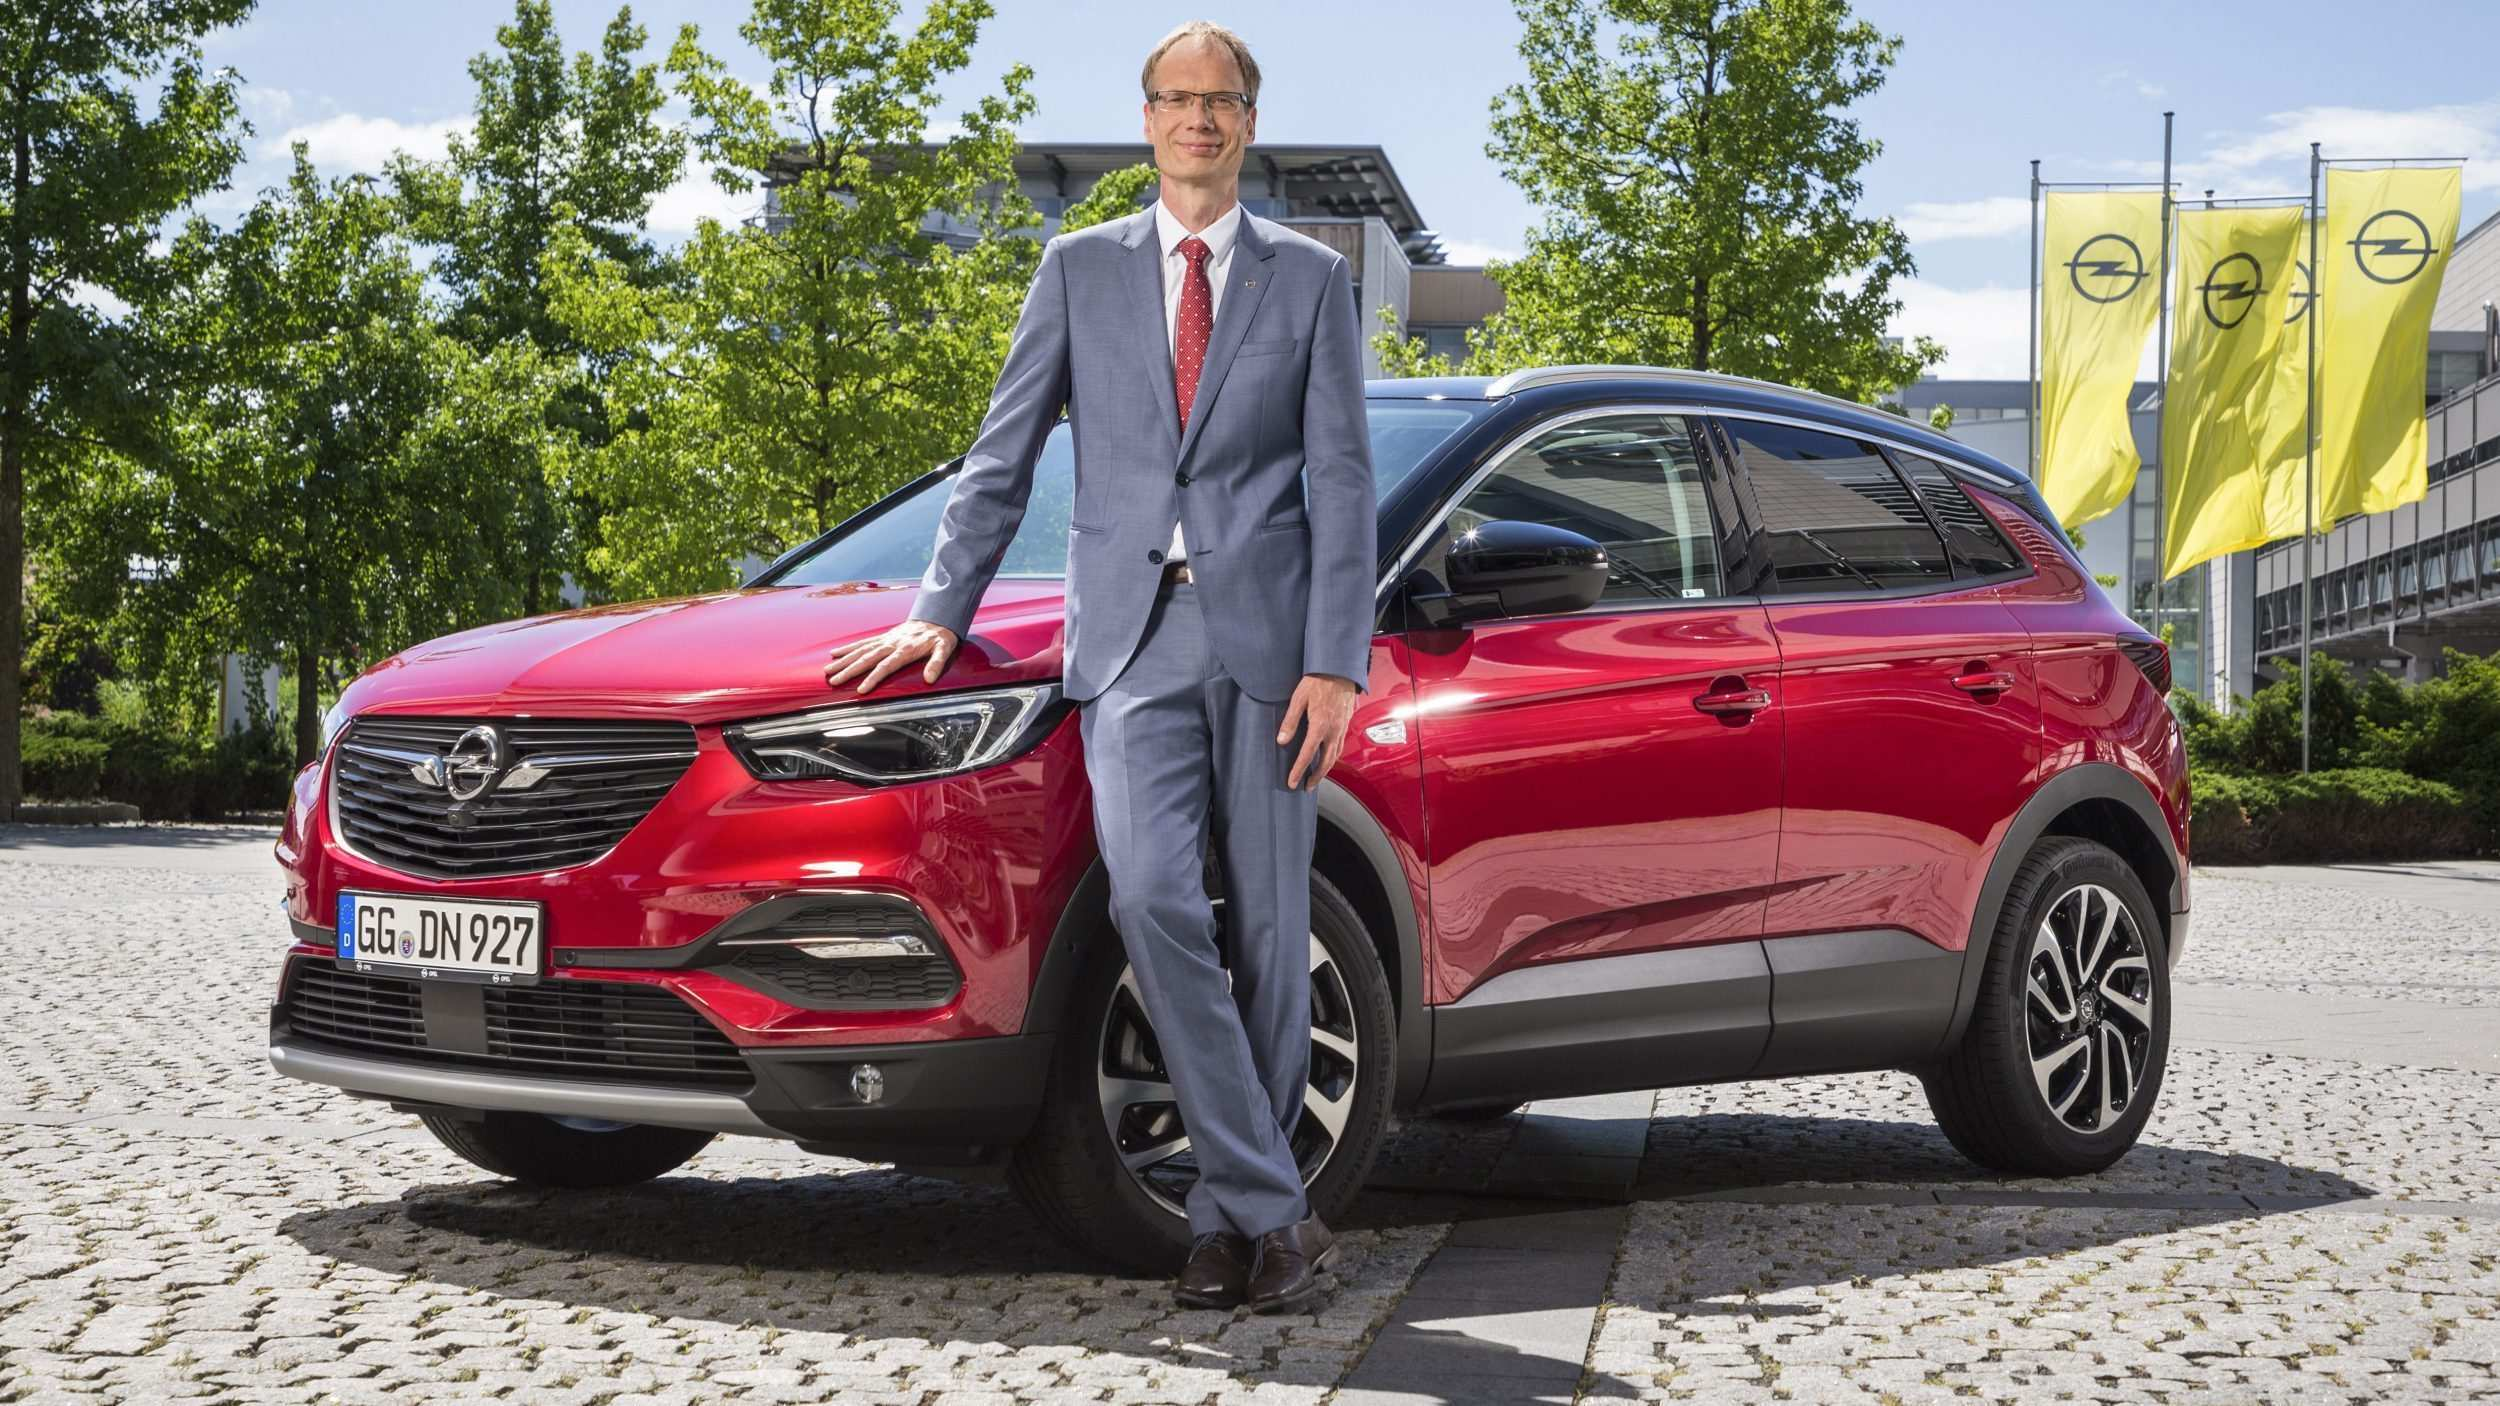 58 Concept of Opel Elektroauto 2020 Rumors with Opel Elektroauto 2020